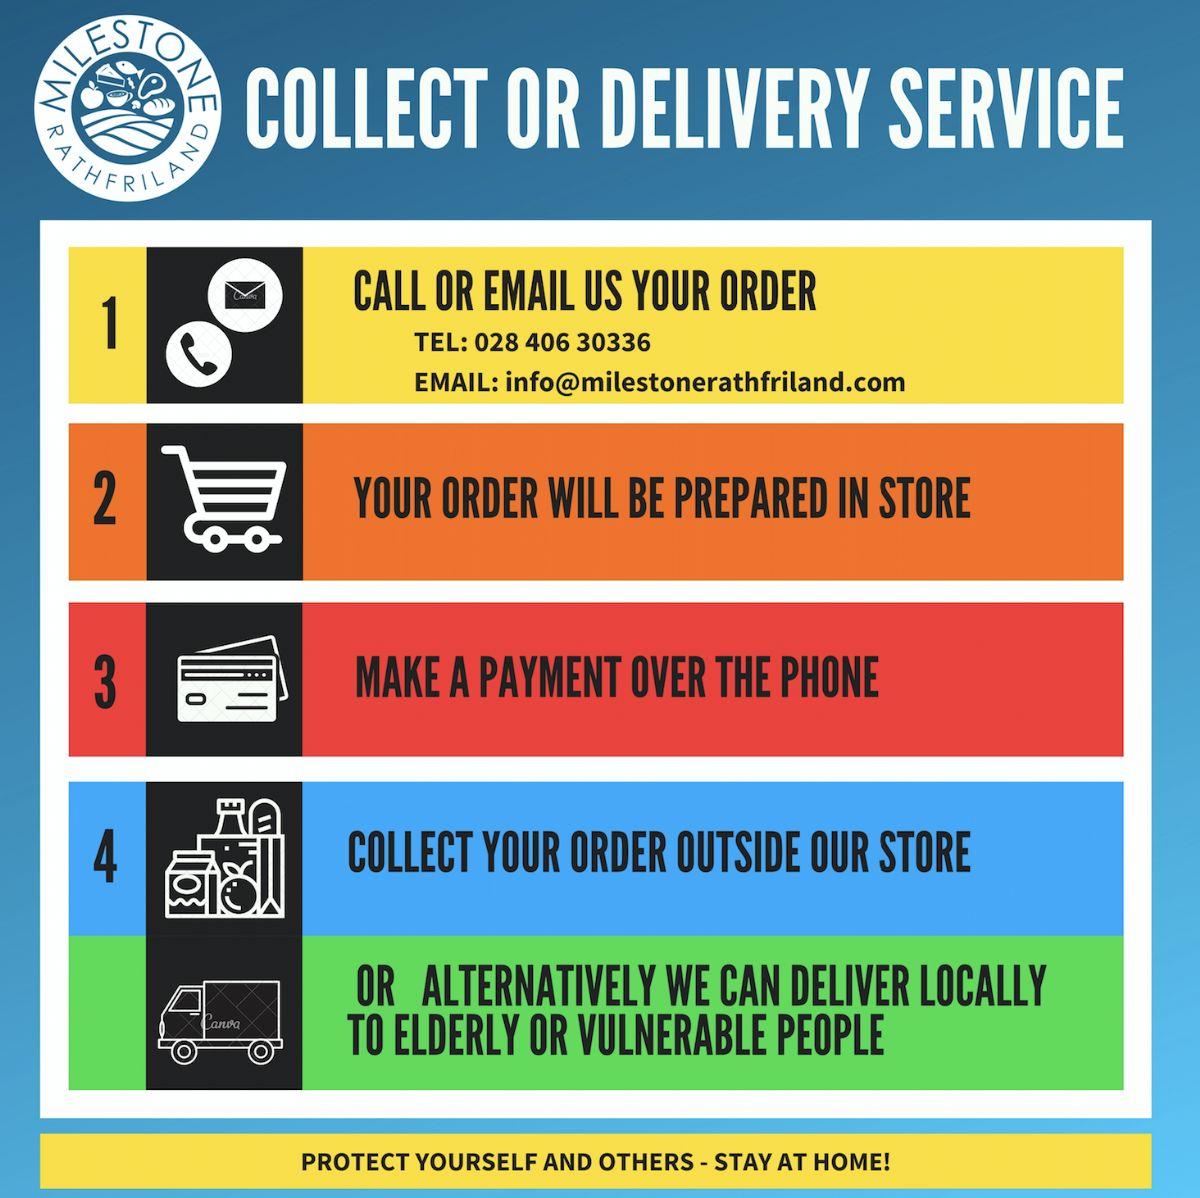 Covid-19 Click and Collect Service